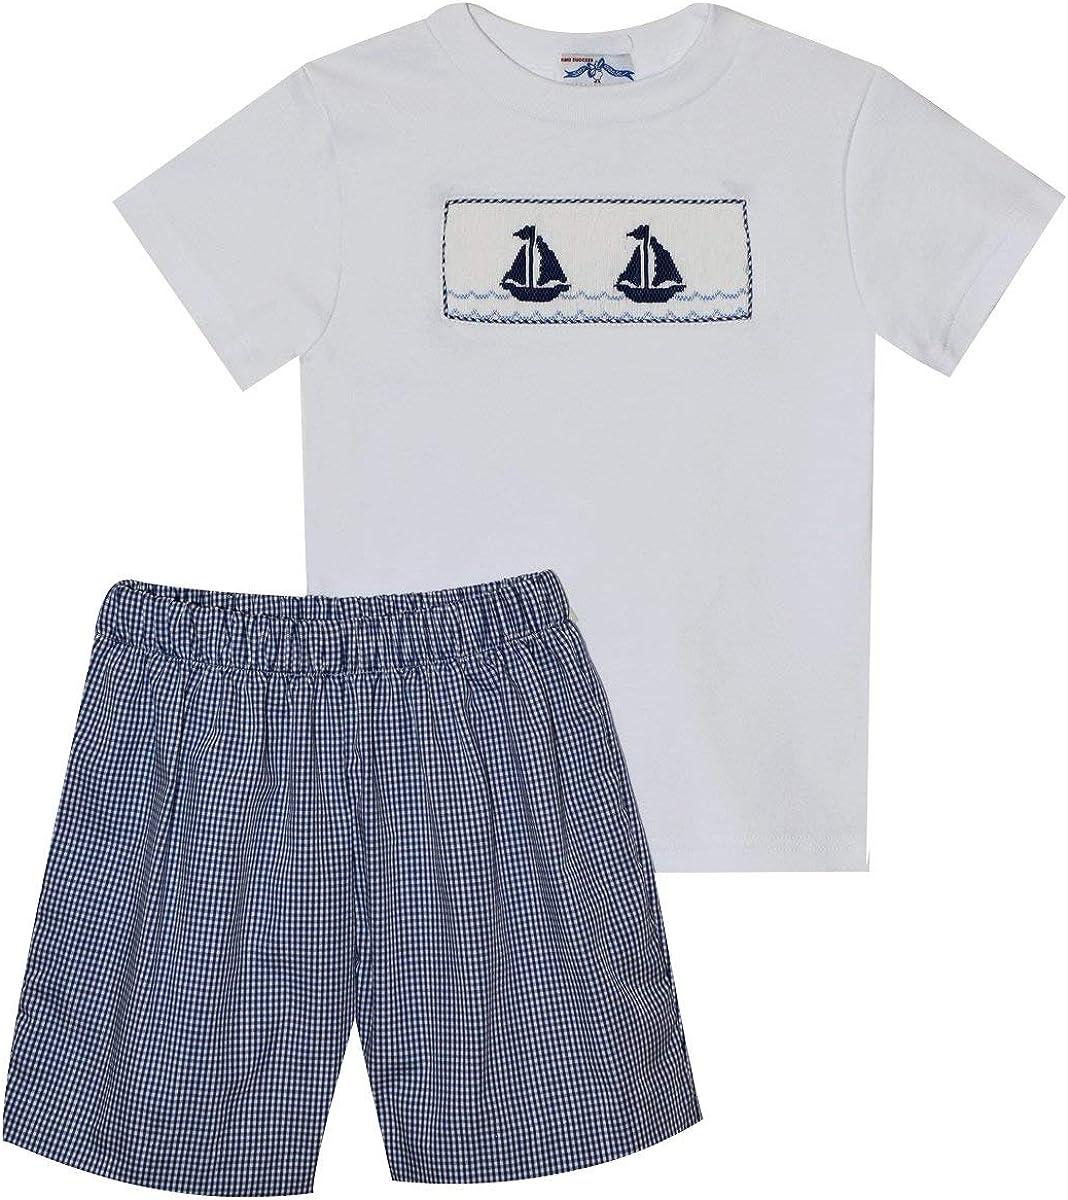 Sails Smocked Navy Check Boys Short Set Short Sleeve